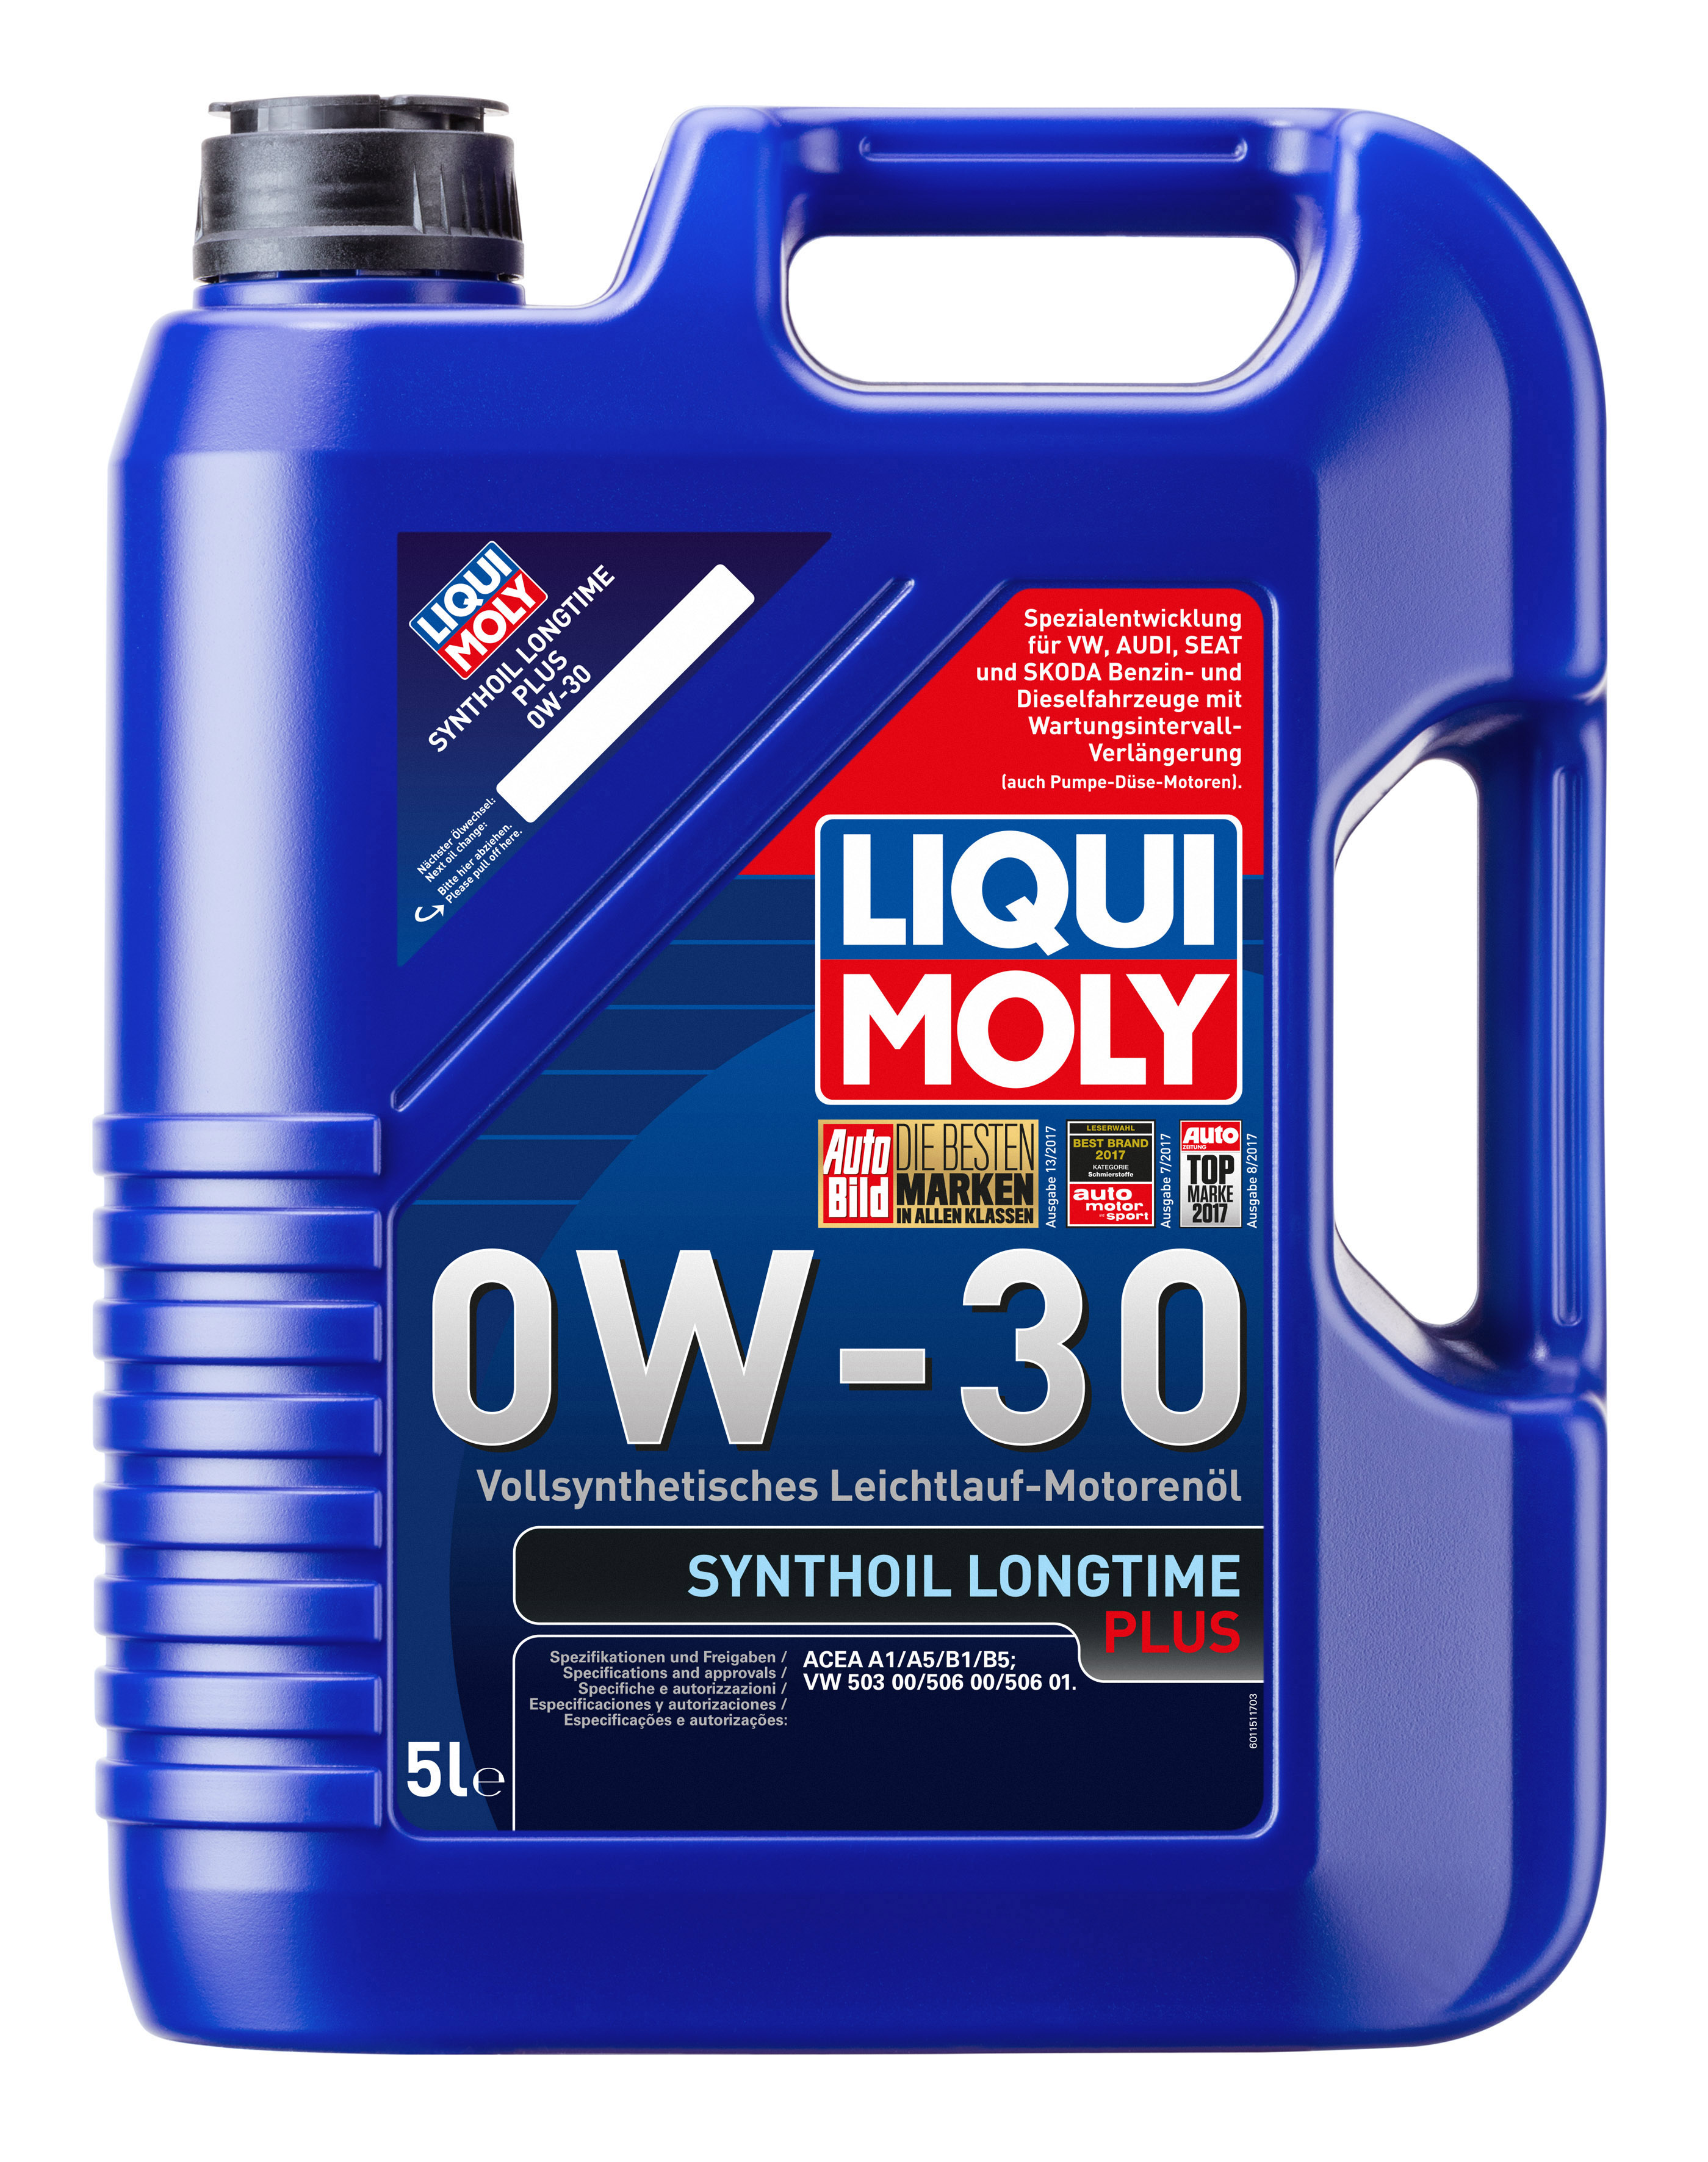 Liqui Moly Synthoil Longtime Plus SAE 0W-30